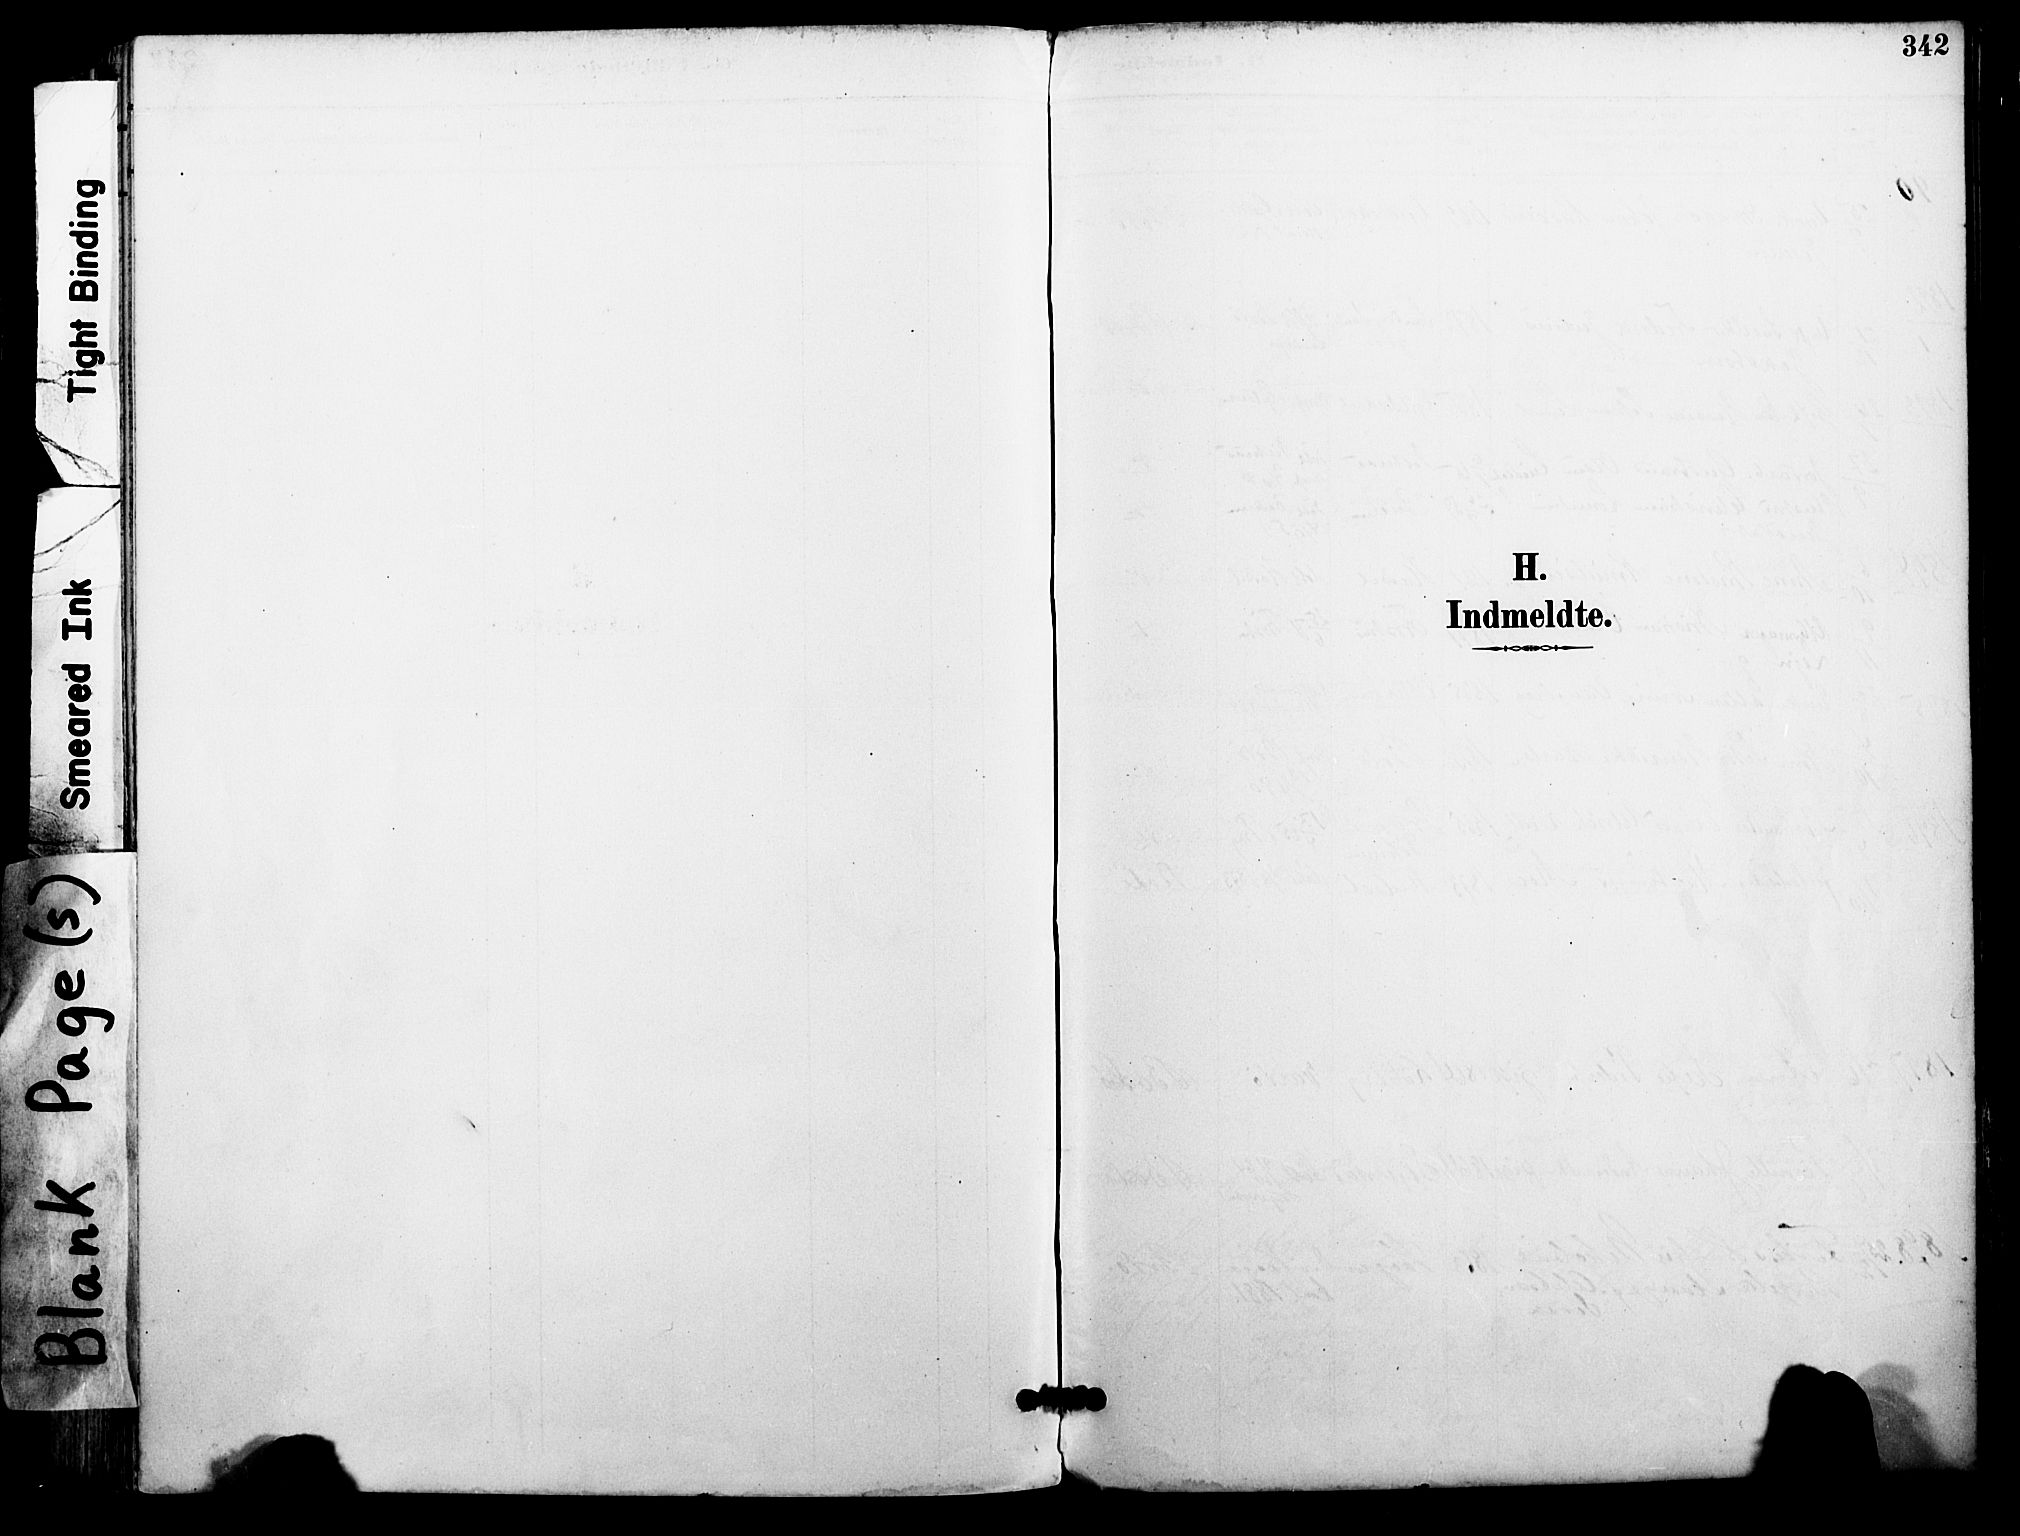 SAT, Ministerialprotokoller, klokkerbøker og fødselsregistre - Nordland, 801/L0010: Ministerialbok nr. 801A10, 1888-1899, s. 342